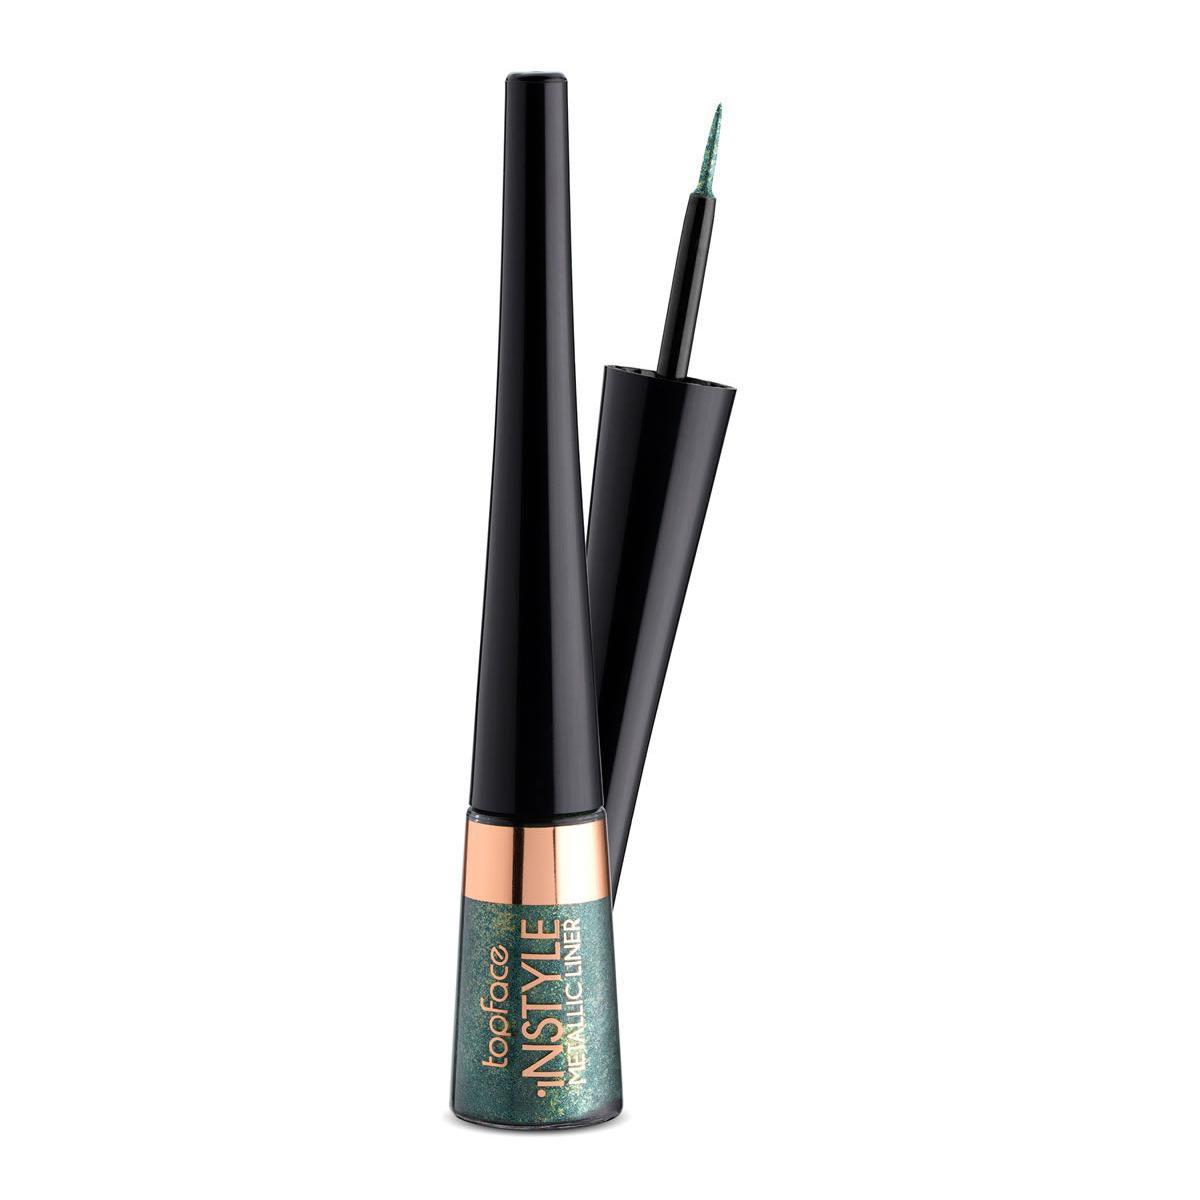 خط چشم متالیک اینستایل تاپ فیس - Instyle Metallic Liner Eyeliner